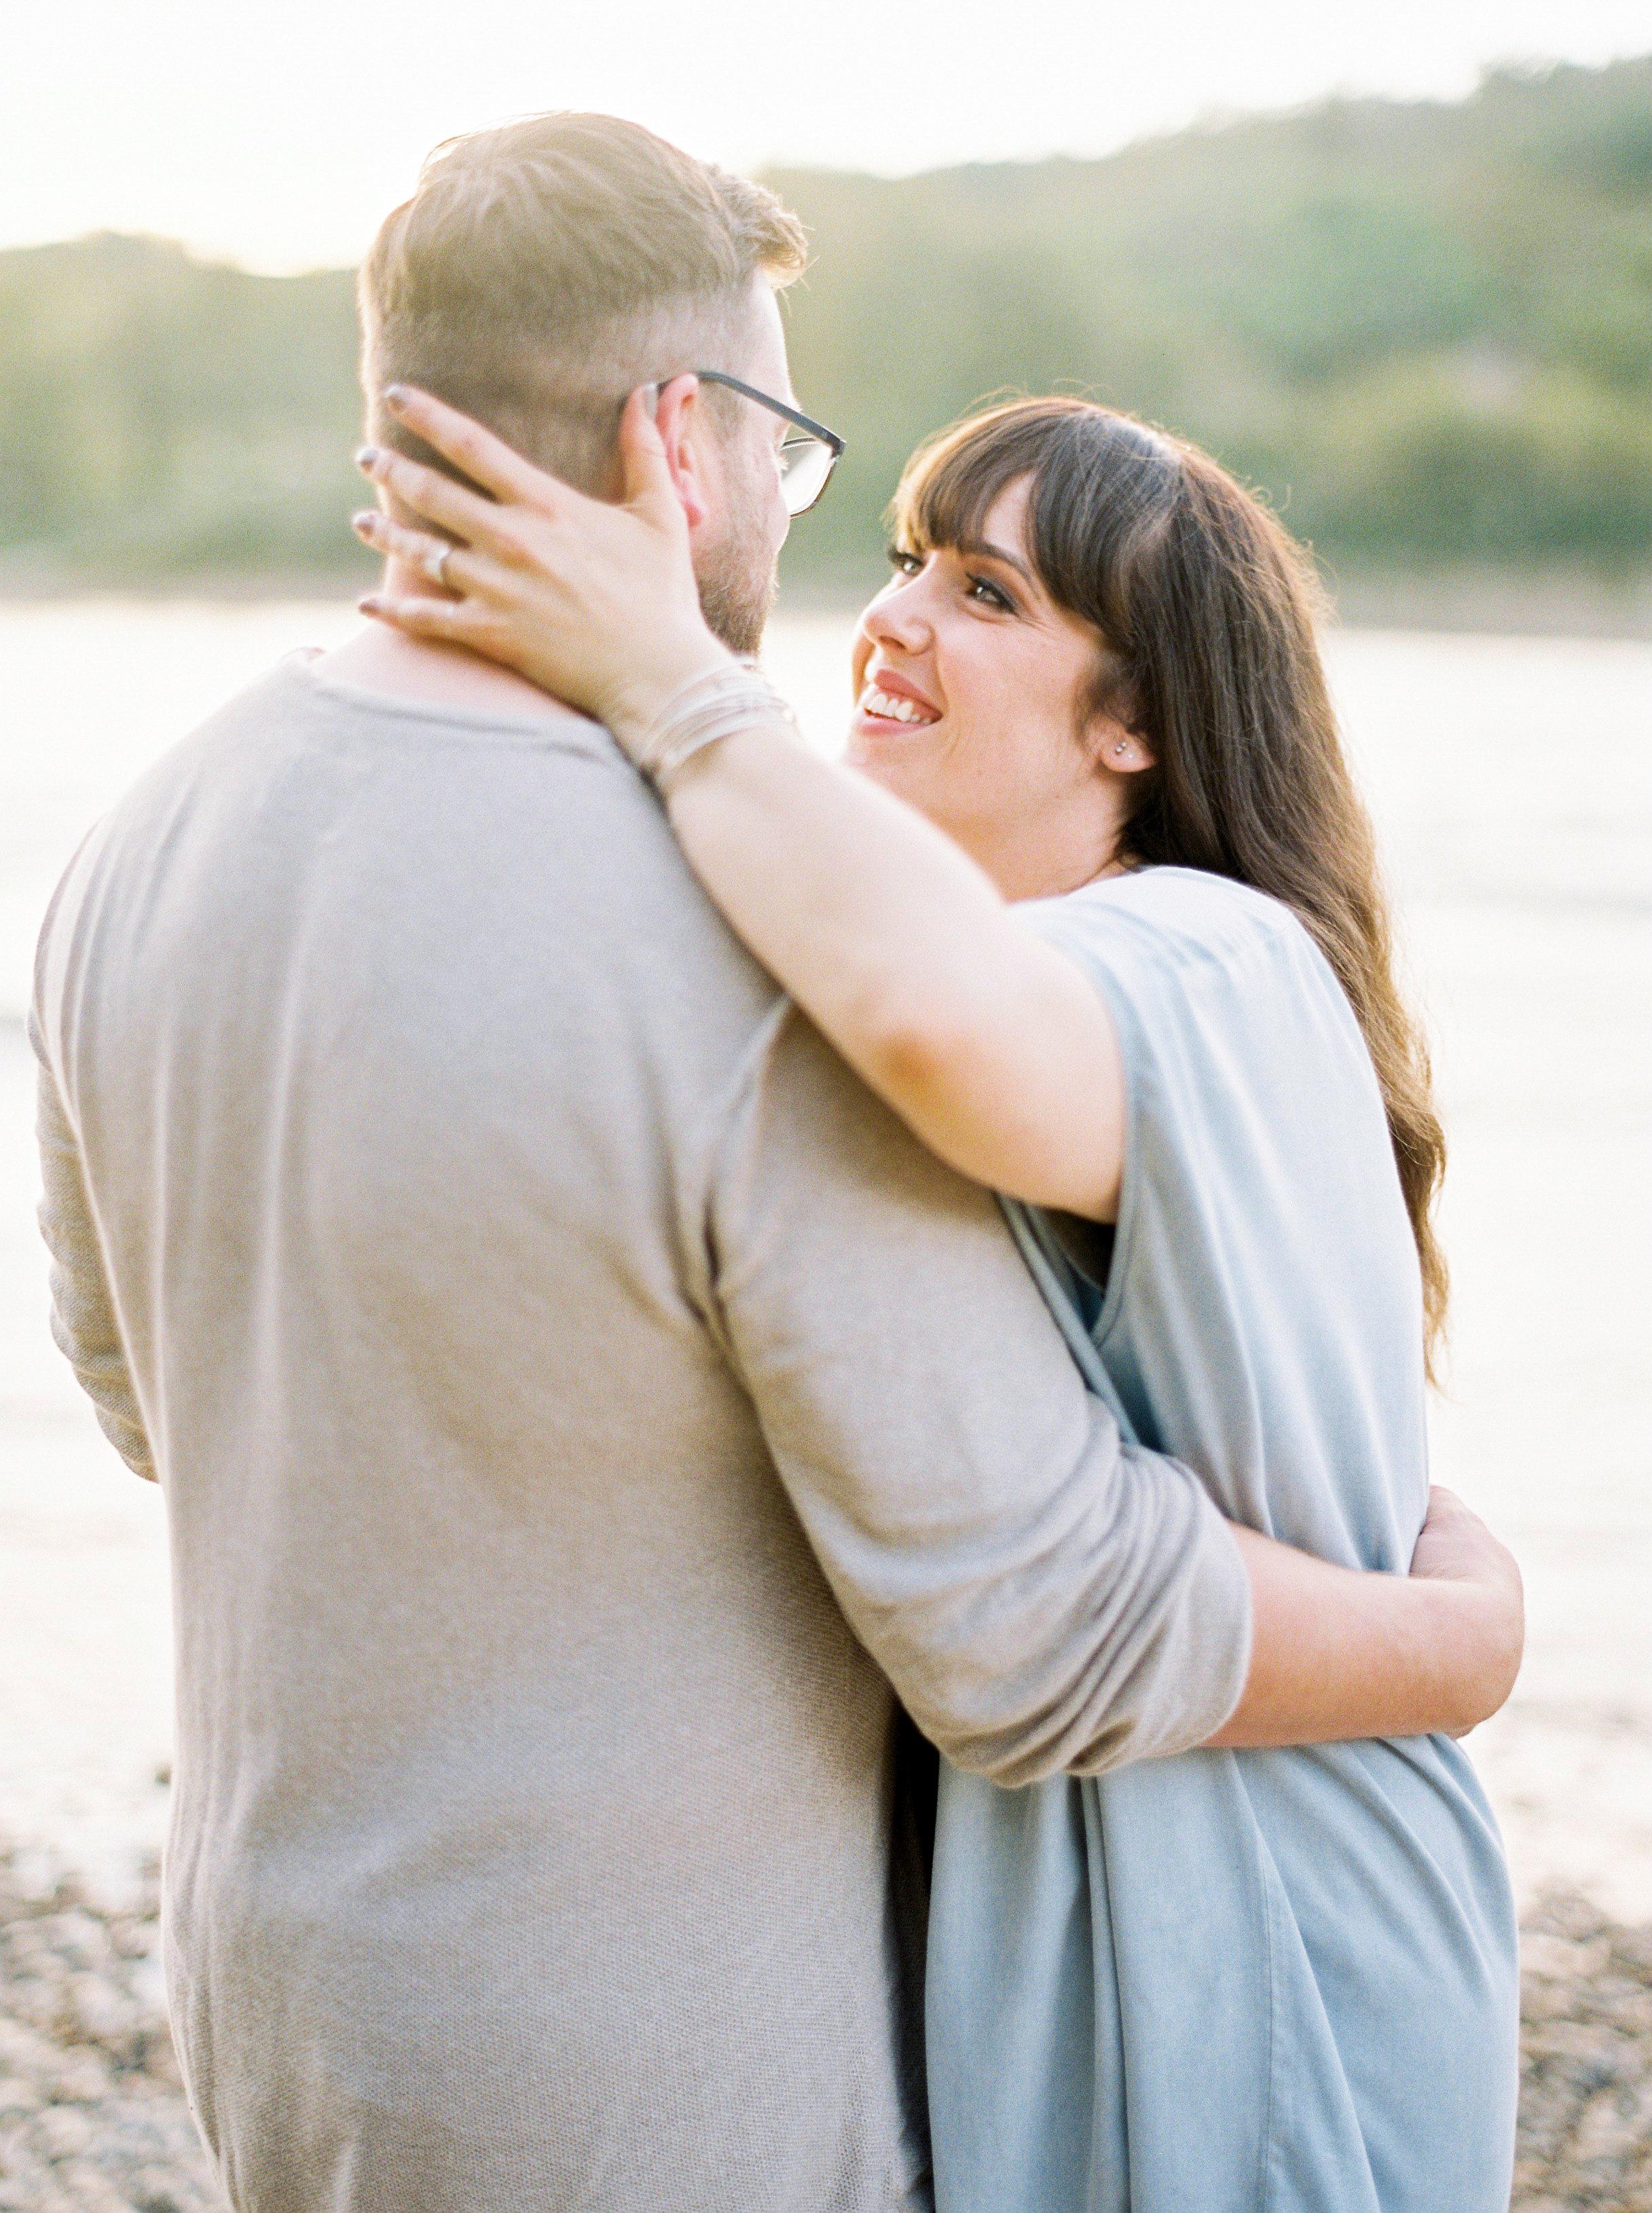 Christine&Sean_FirstGlanceStudios-22.jpg